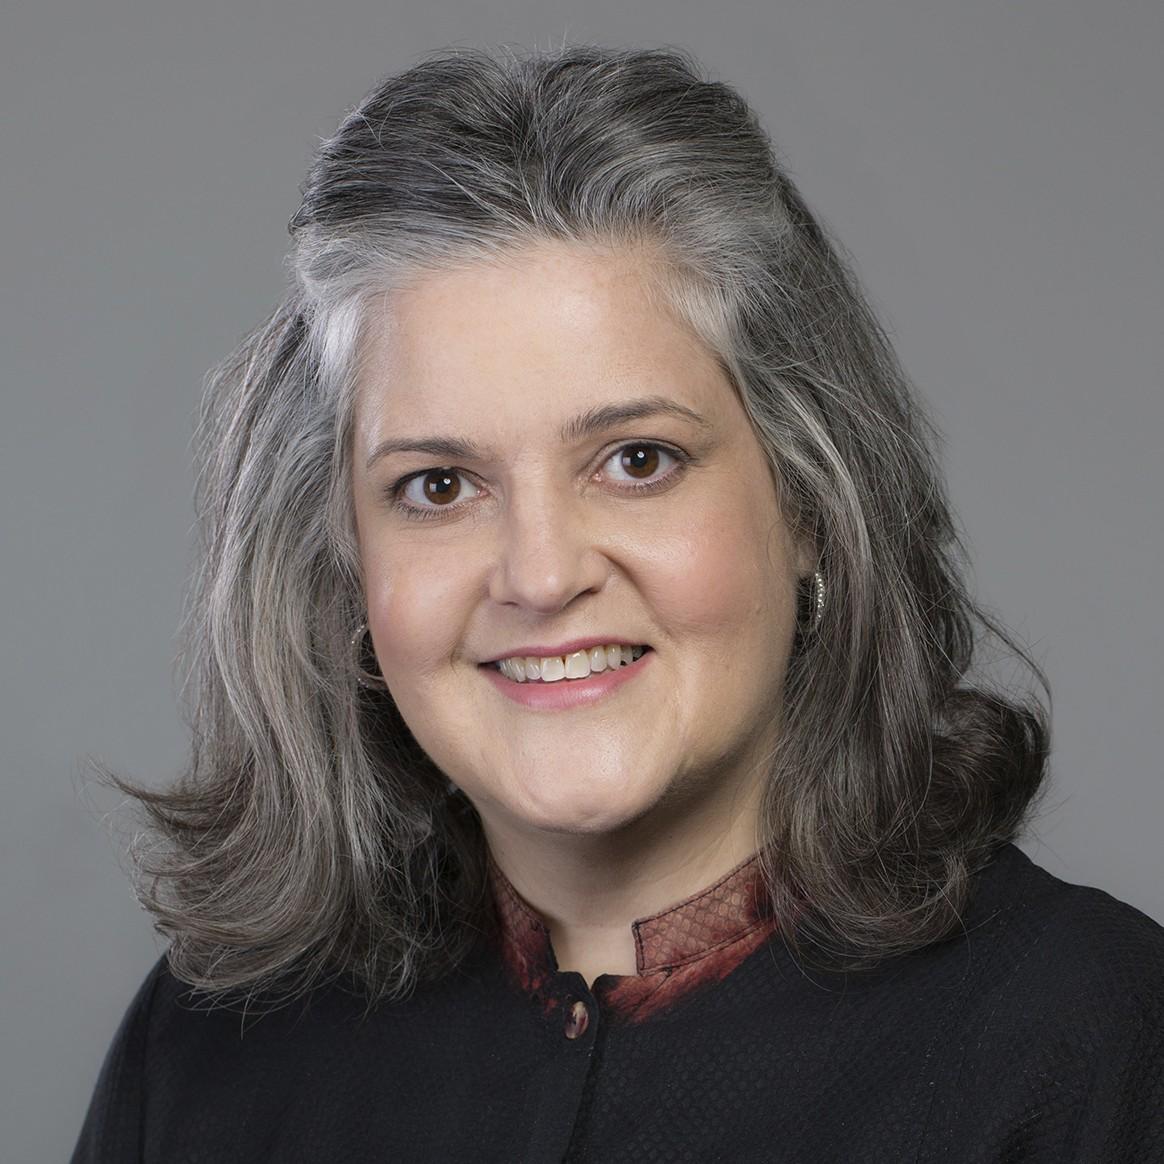 Headshot of Penn State Music Education Professor Ann Clements